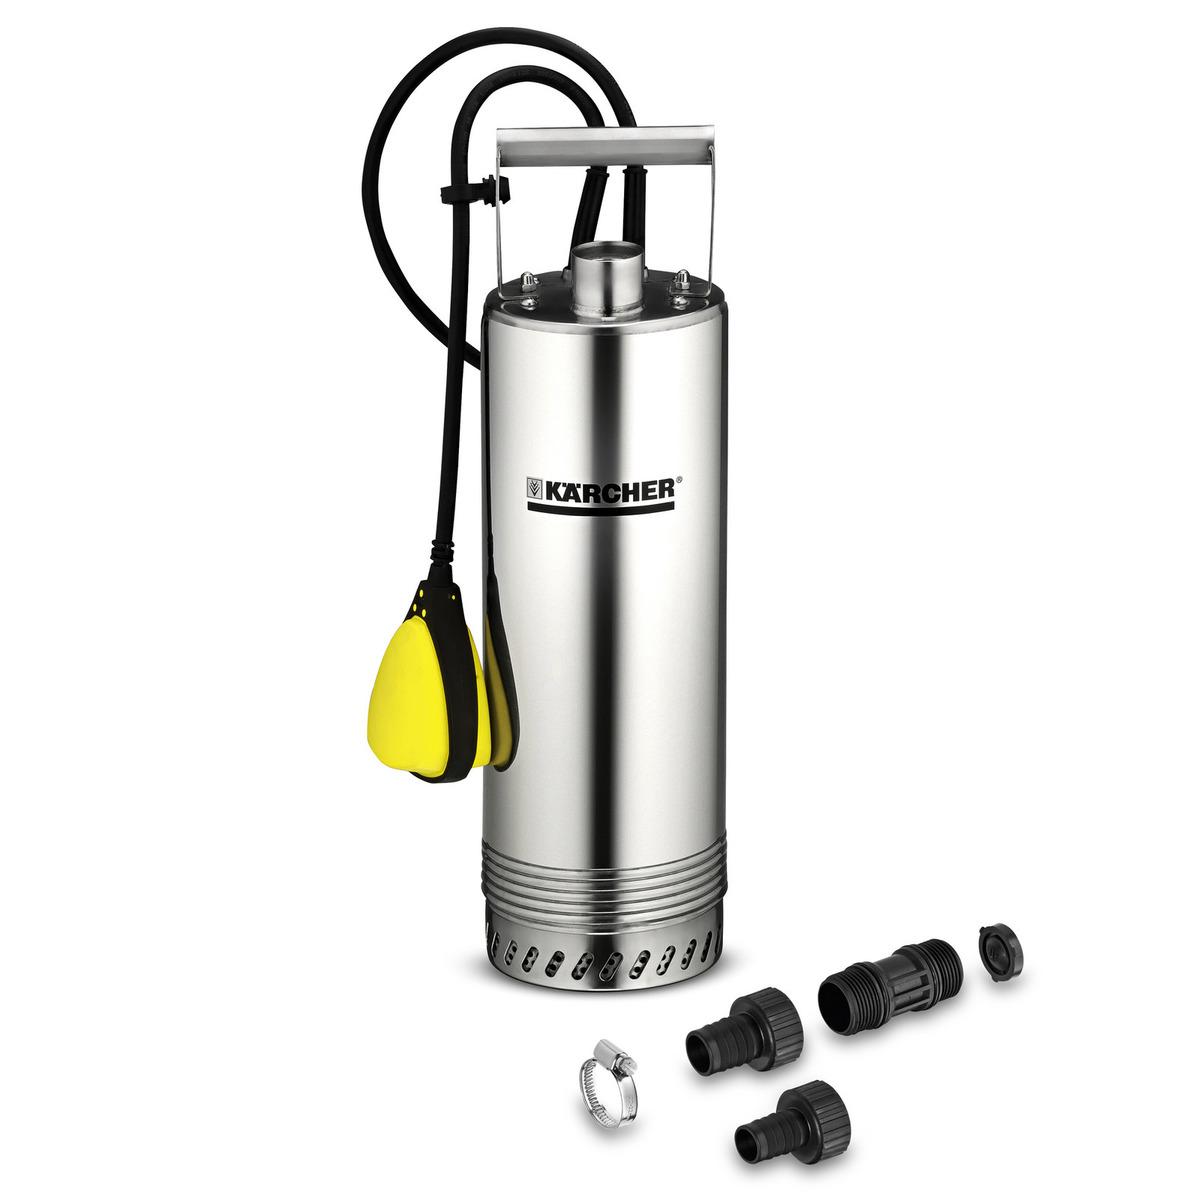 Kärcher BP 2 Cistern